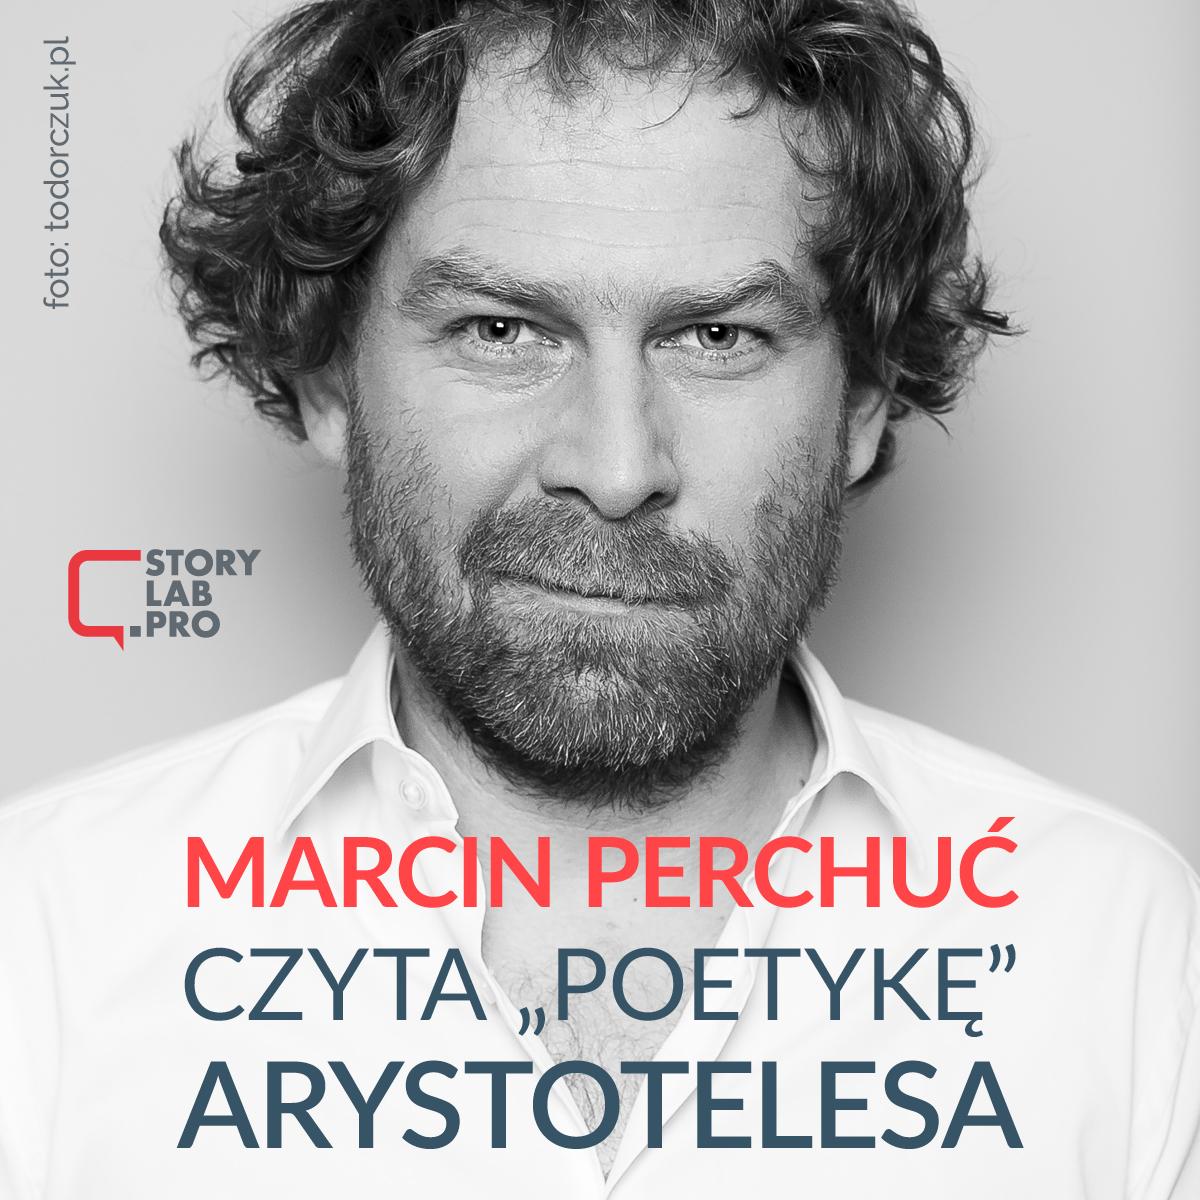 Storylab_poetyka_arystoteles_marcin_perchuc_2